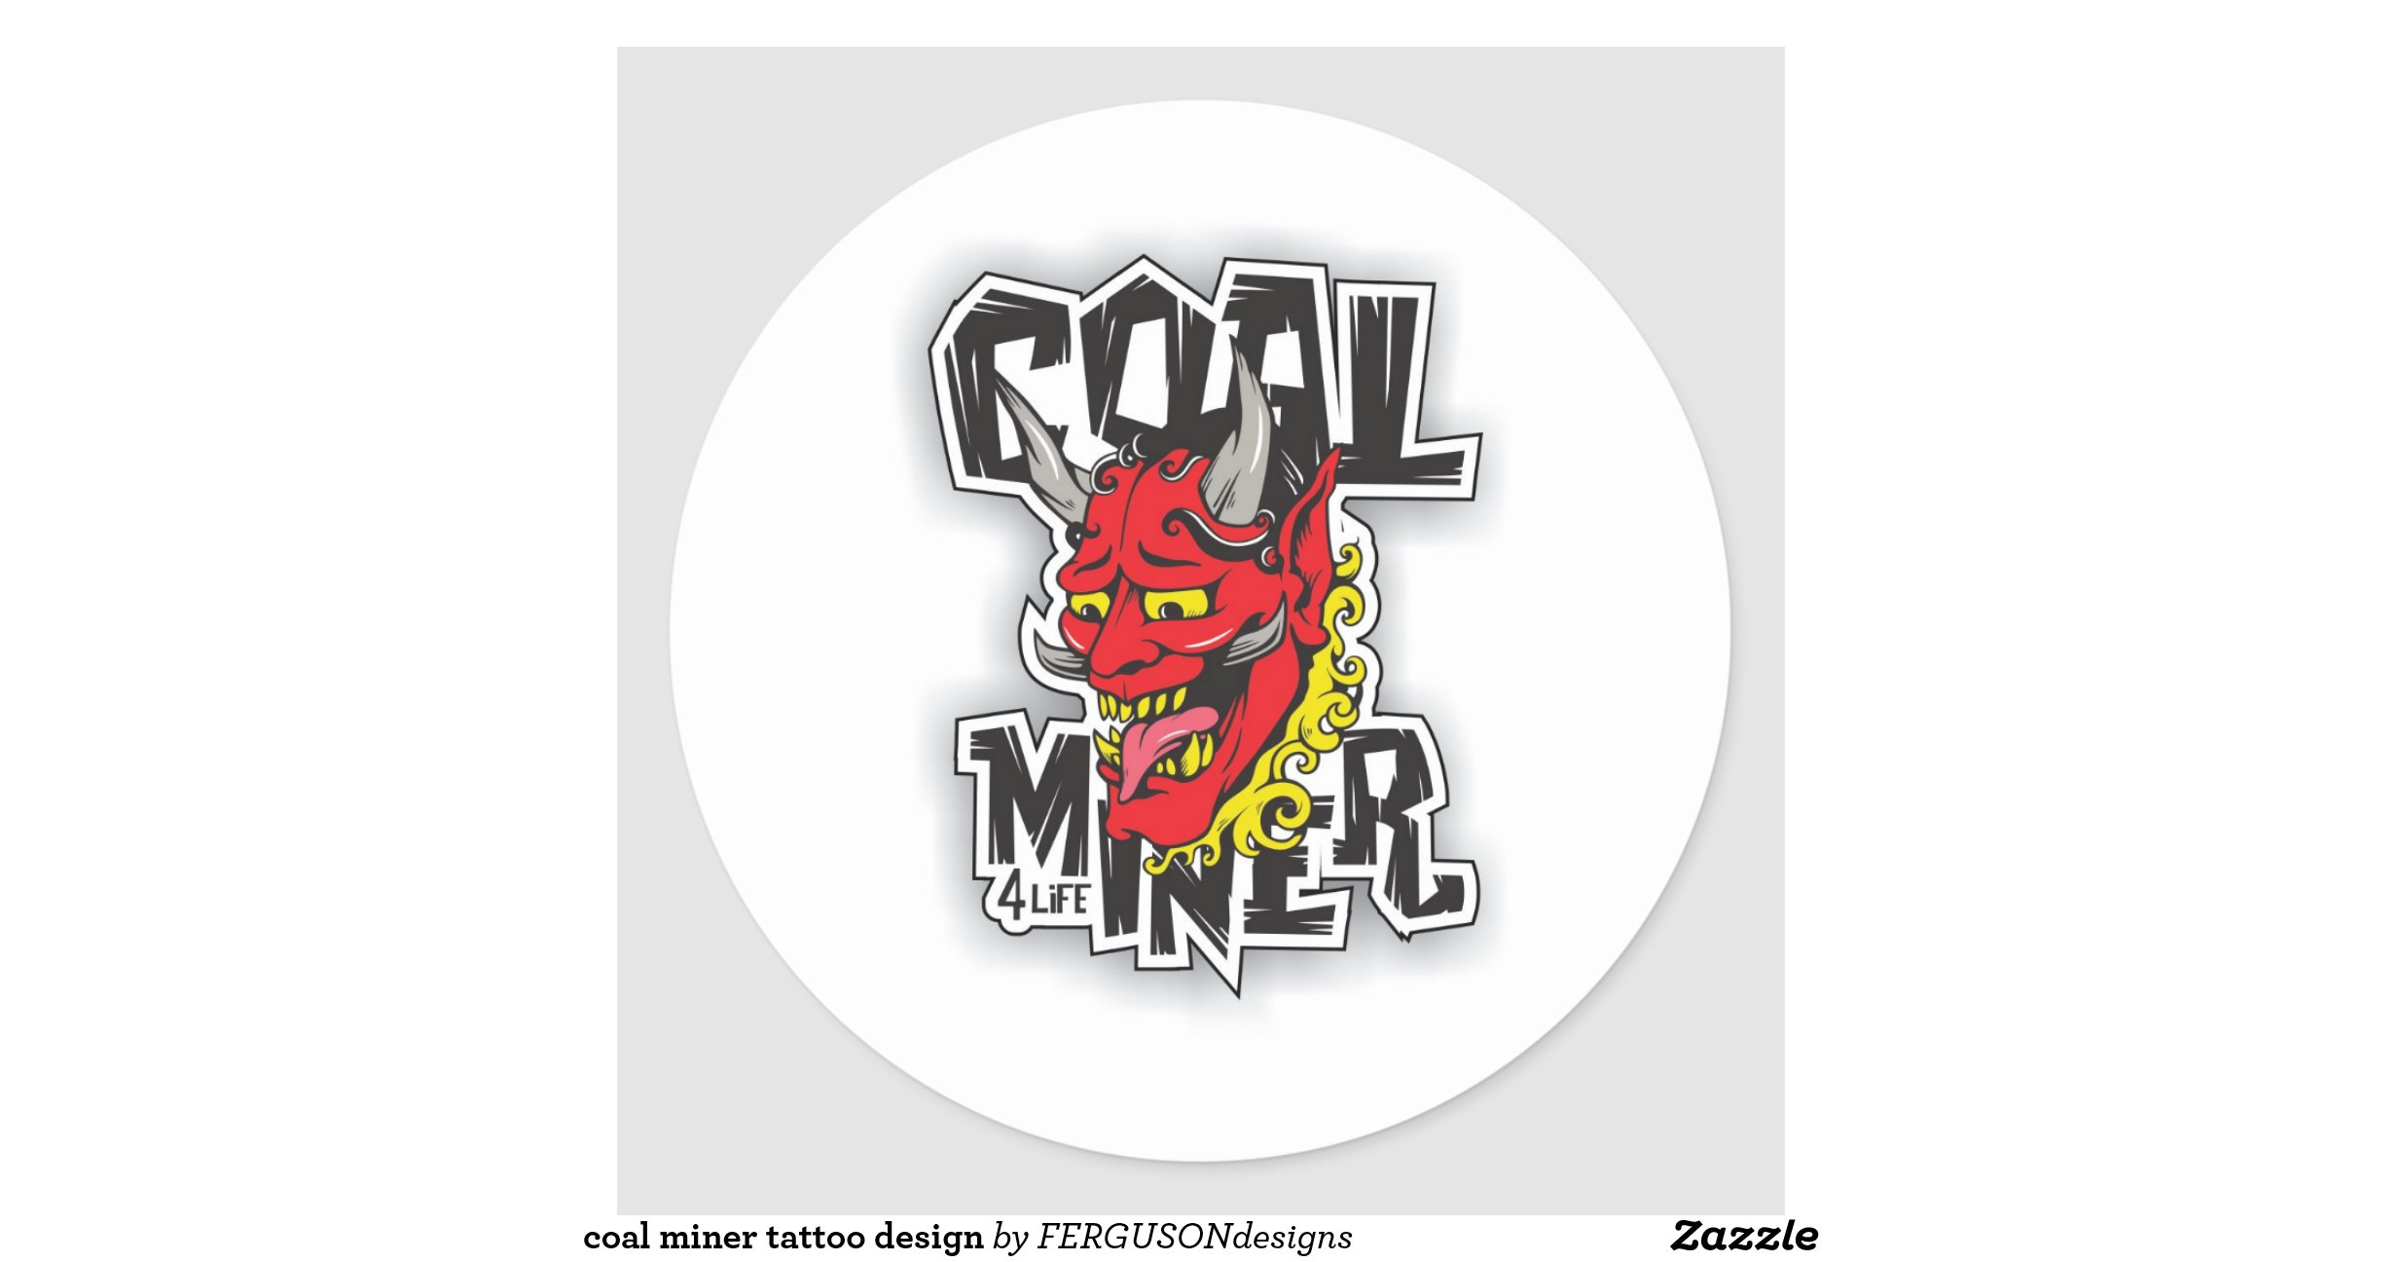 coal miner tattoo design classic round sticker r838ccf0669ea4f99bdc639eecc78aa9e v9waf 8byvr. Black Bedroom Furniture Sets. Home Design Ideas